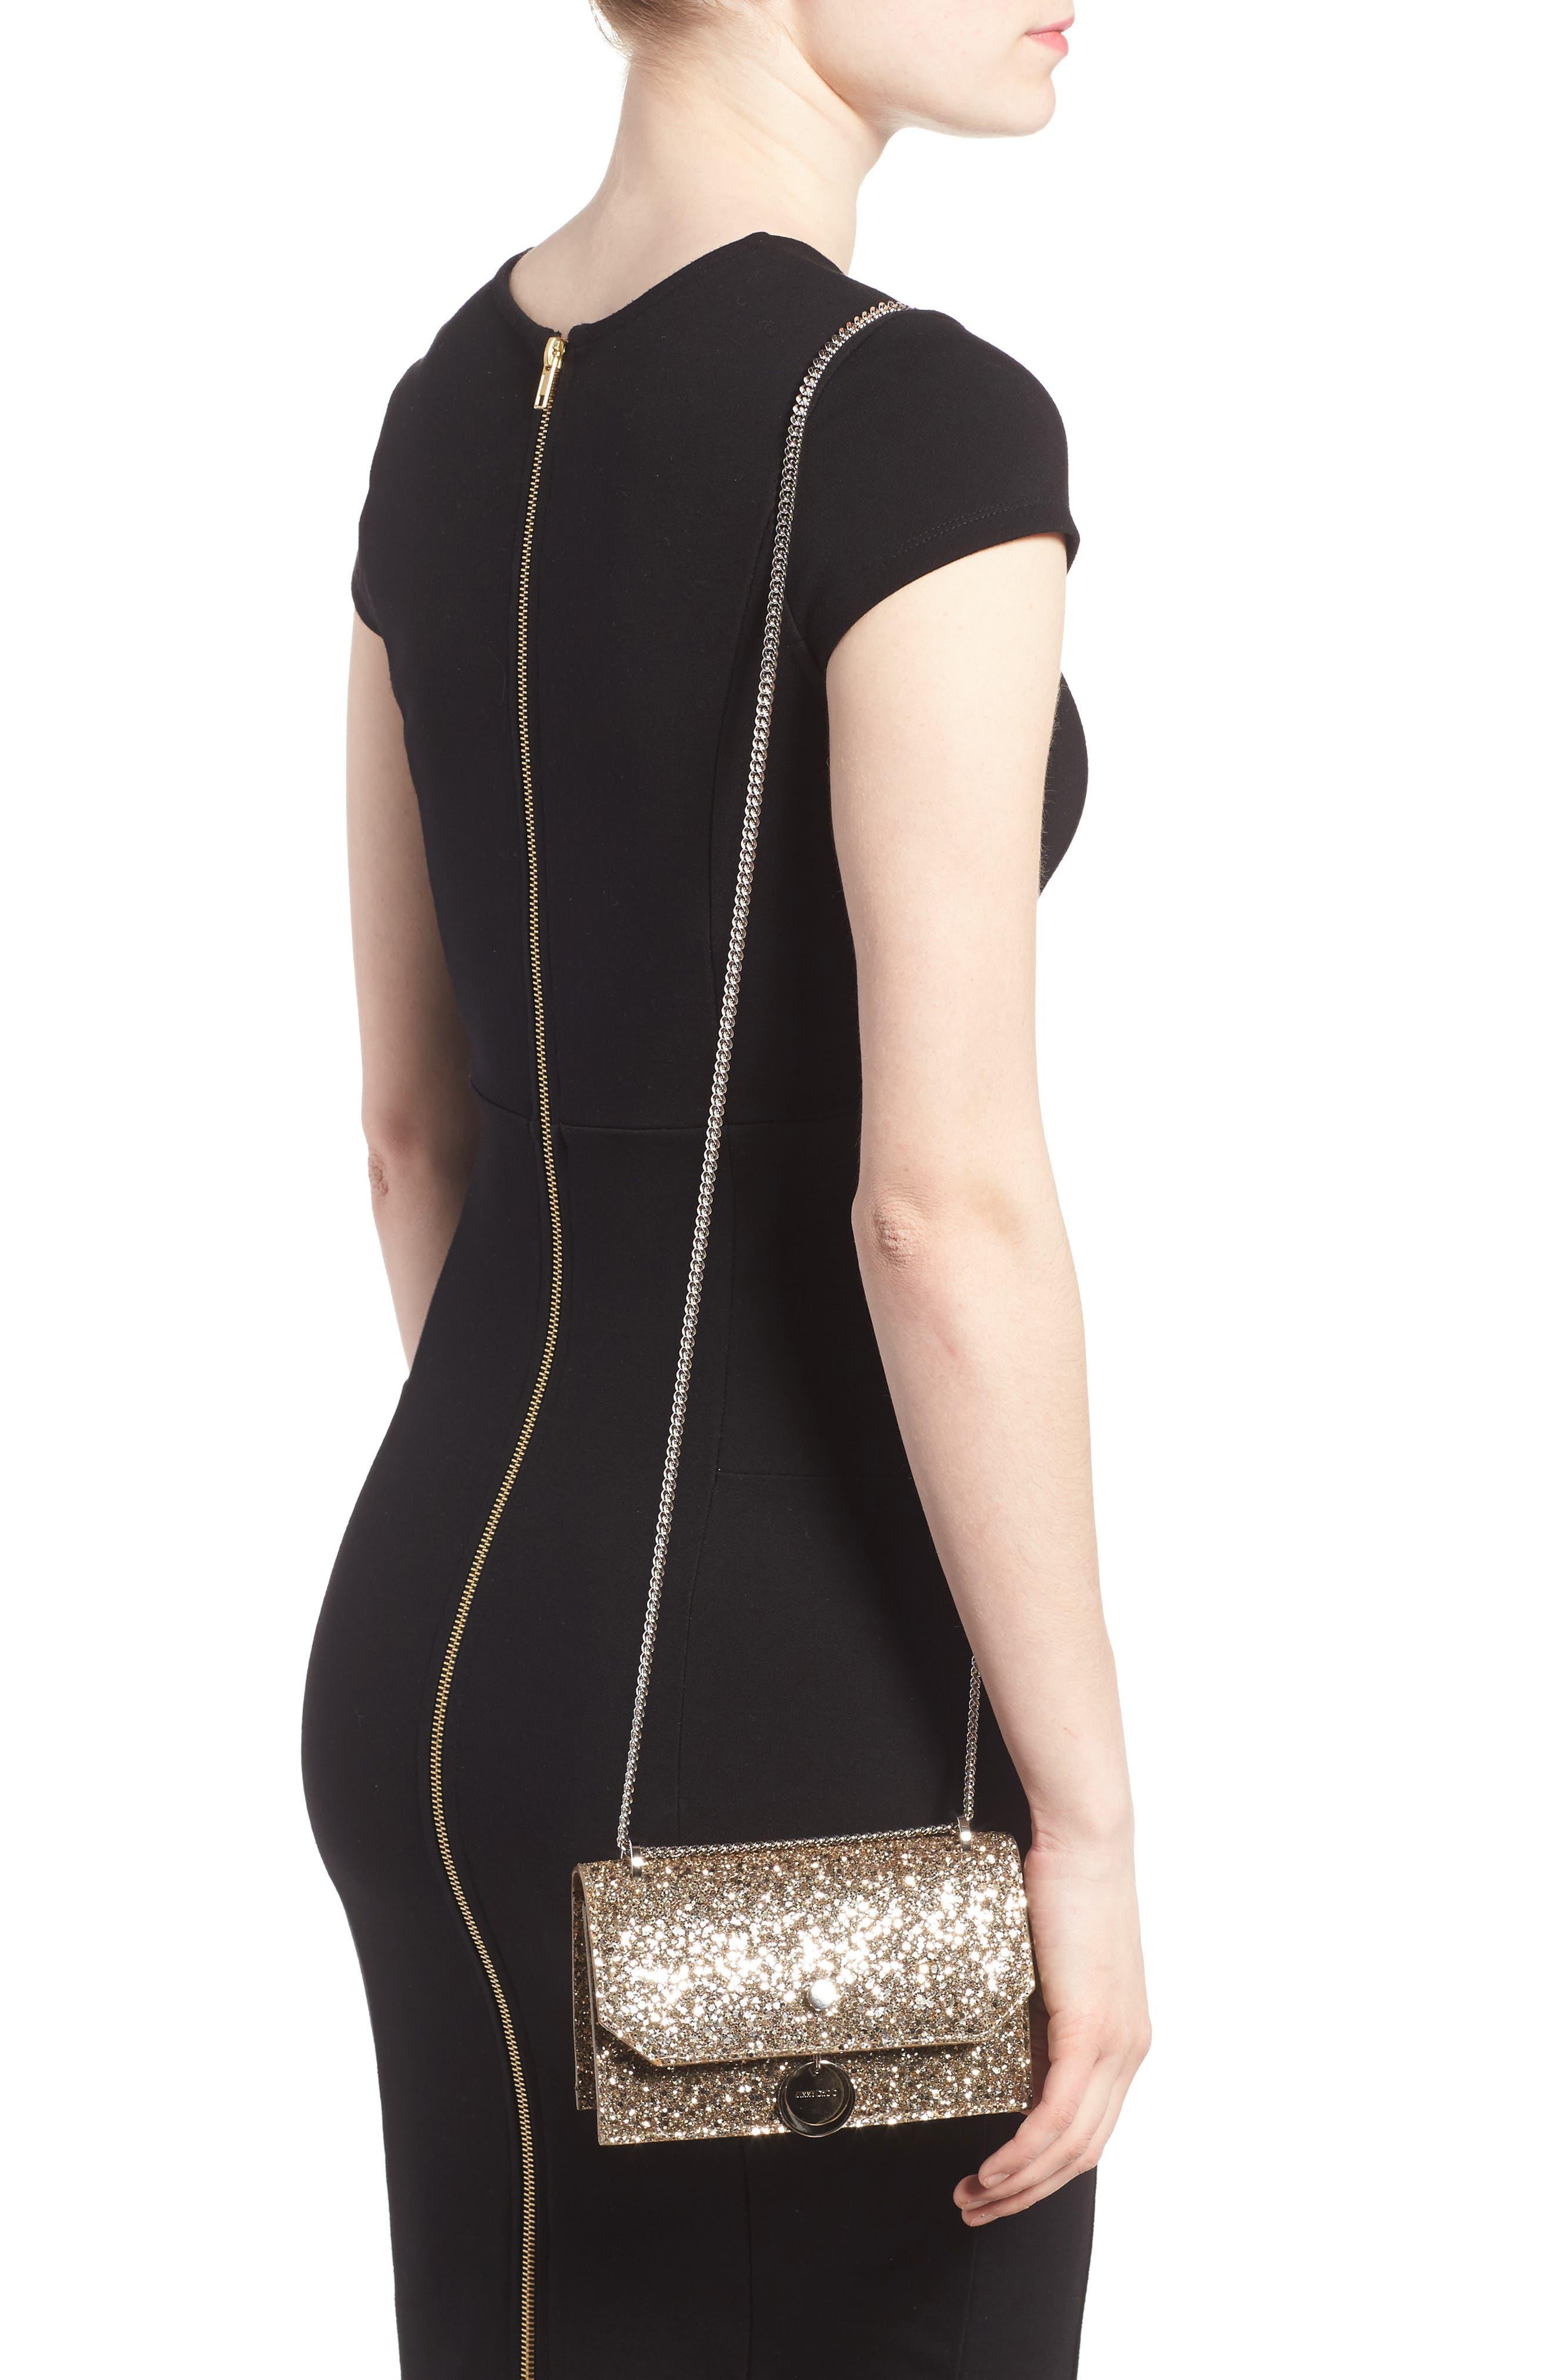 Finley Shadow Glitter Shoulder Bag,                             Alternate thumbnail 2, color,                             Antique Gold